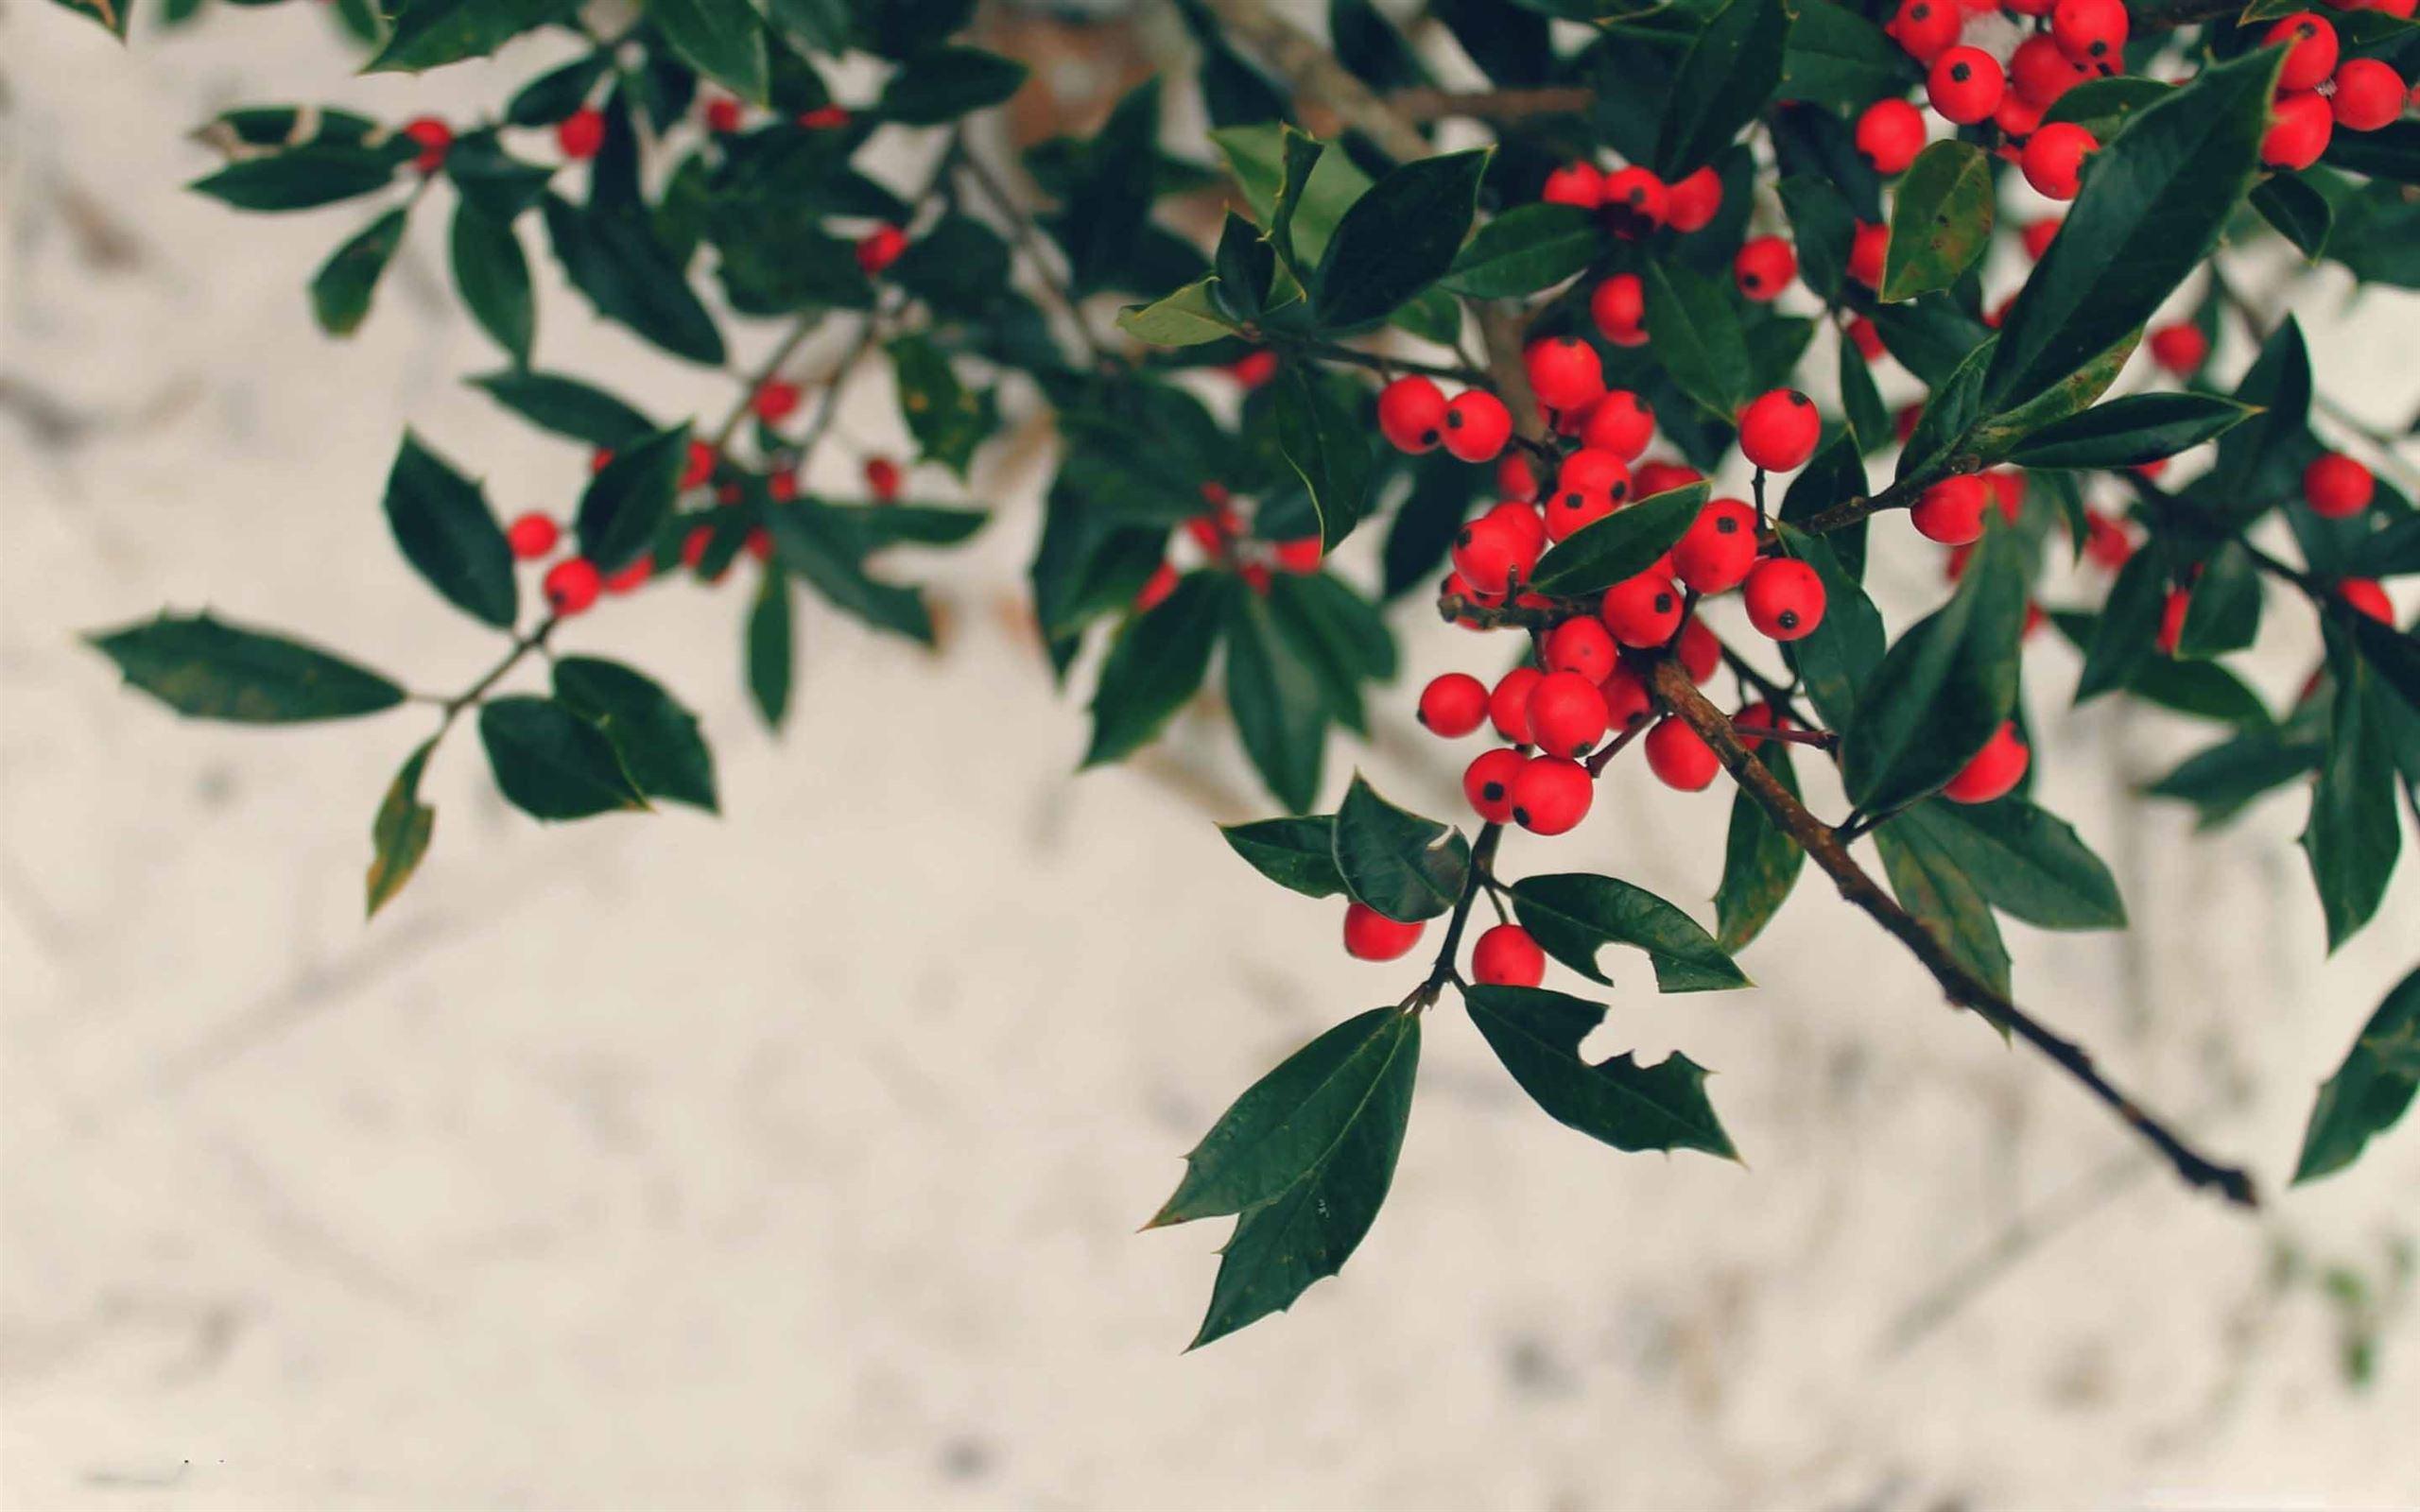 Berries Winter Mac Wallpaper Download